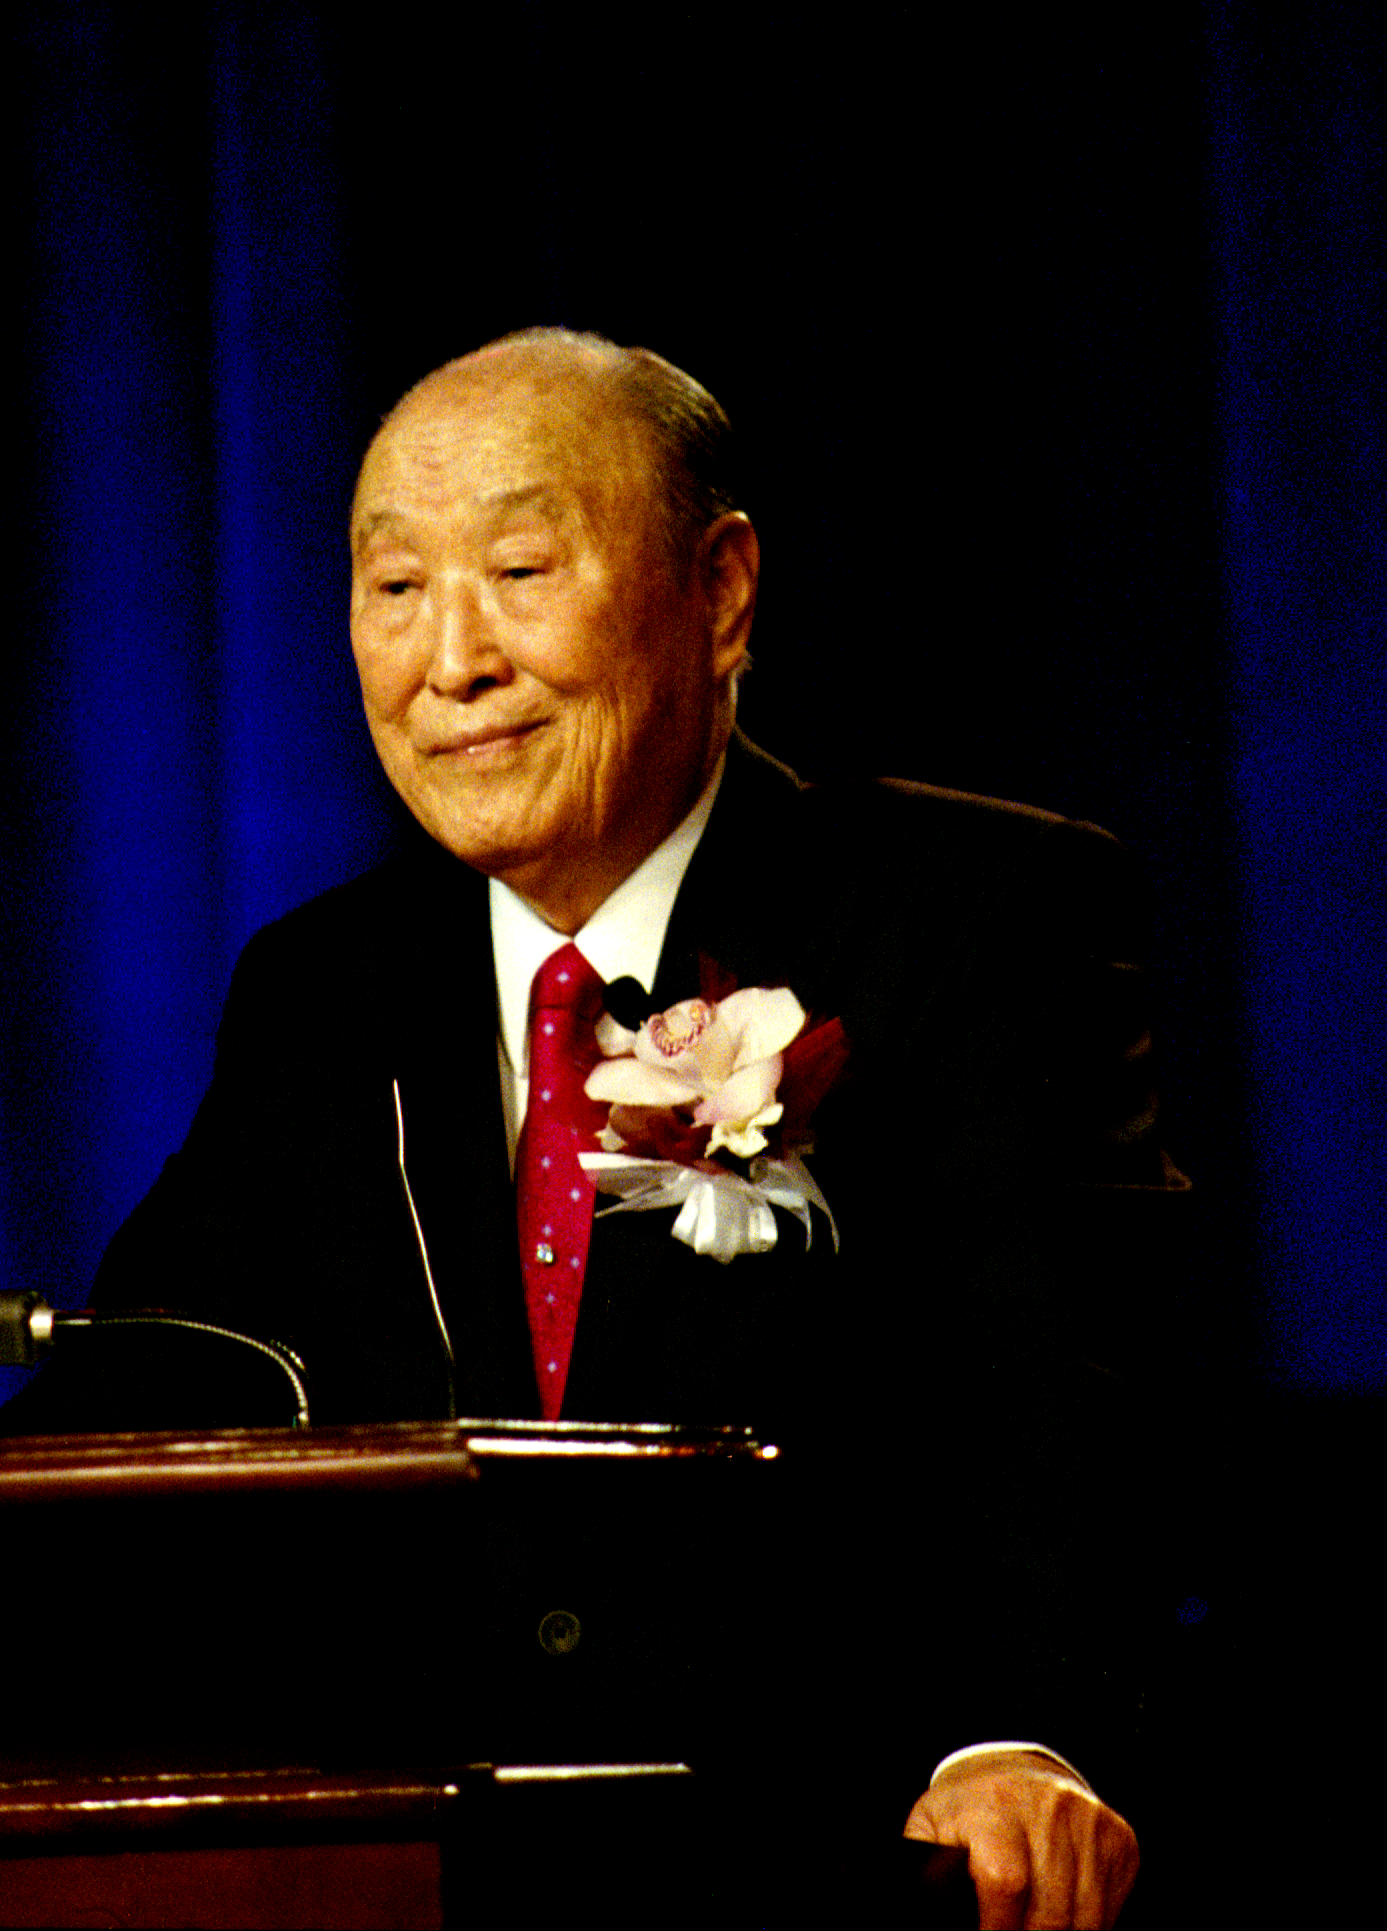 Rev._Sun_Myung_Moon_speaks,_Las_Vegas,_NV,_USA_on_April_4,_2010 -